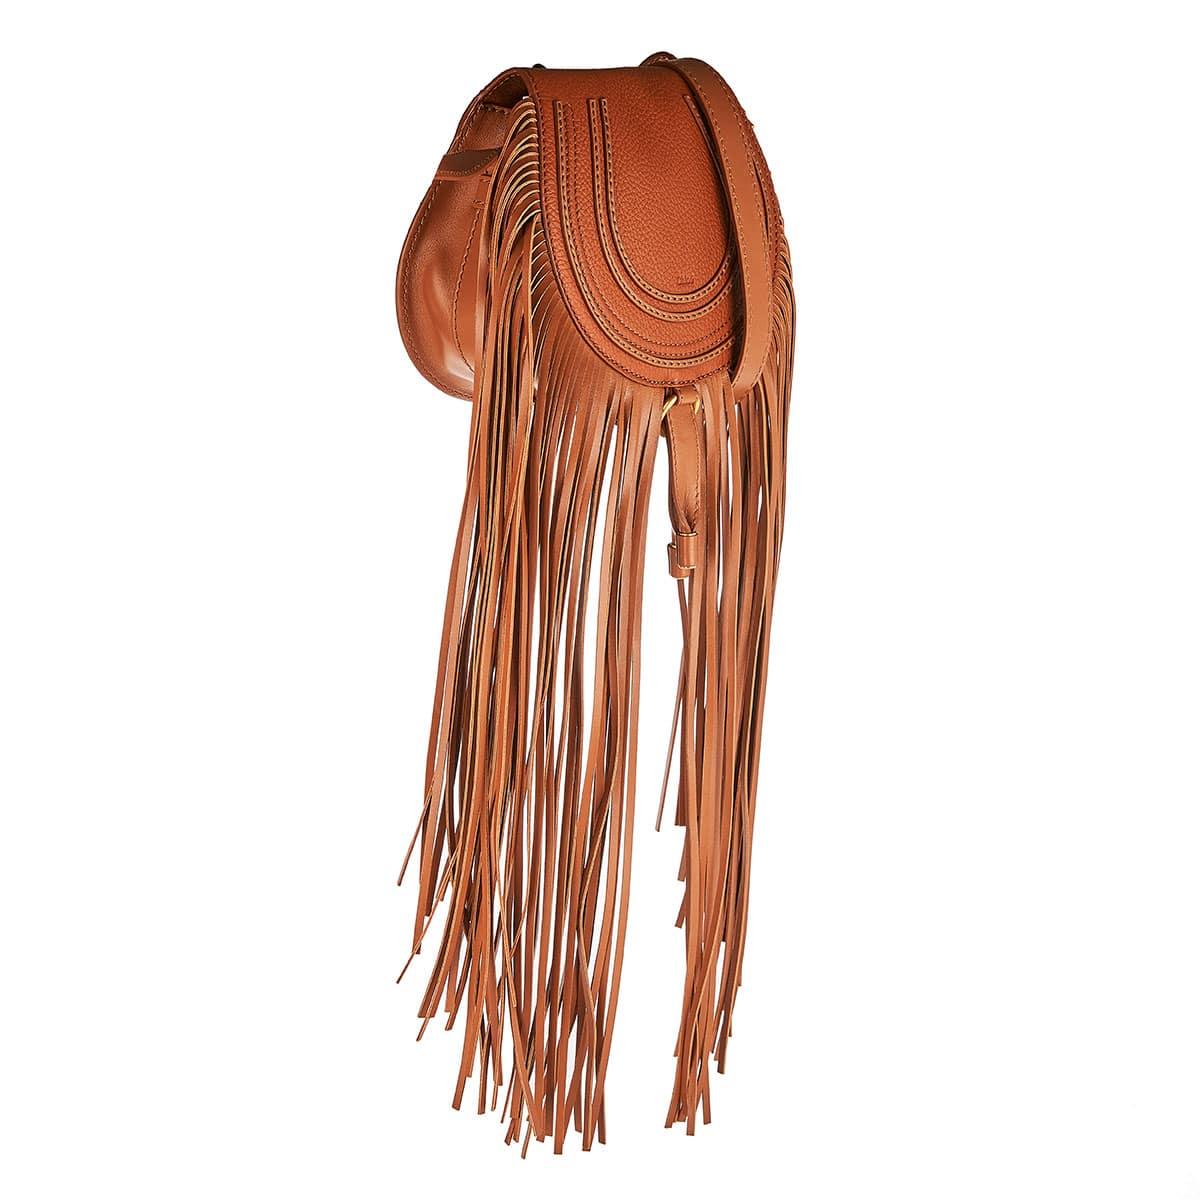 Marcie mini fringed leather bag